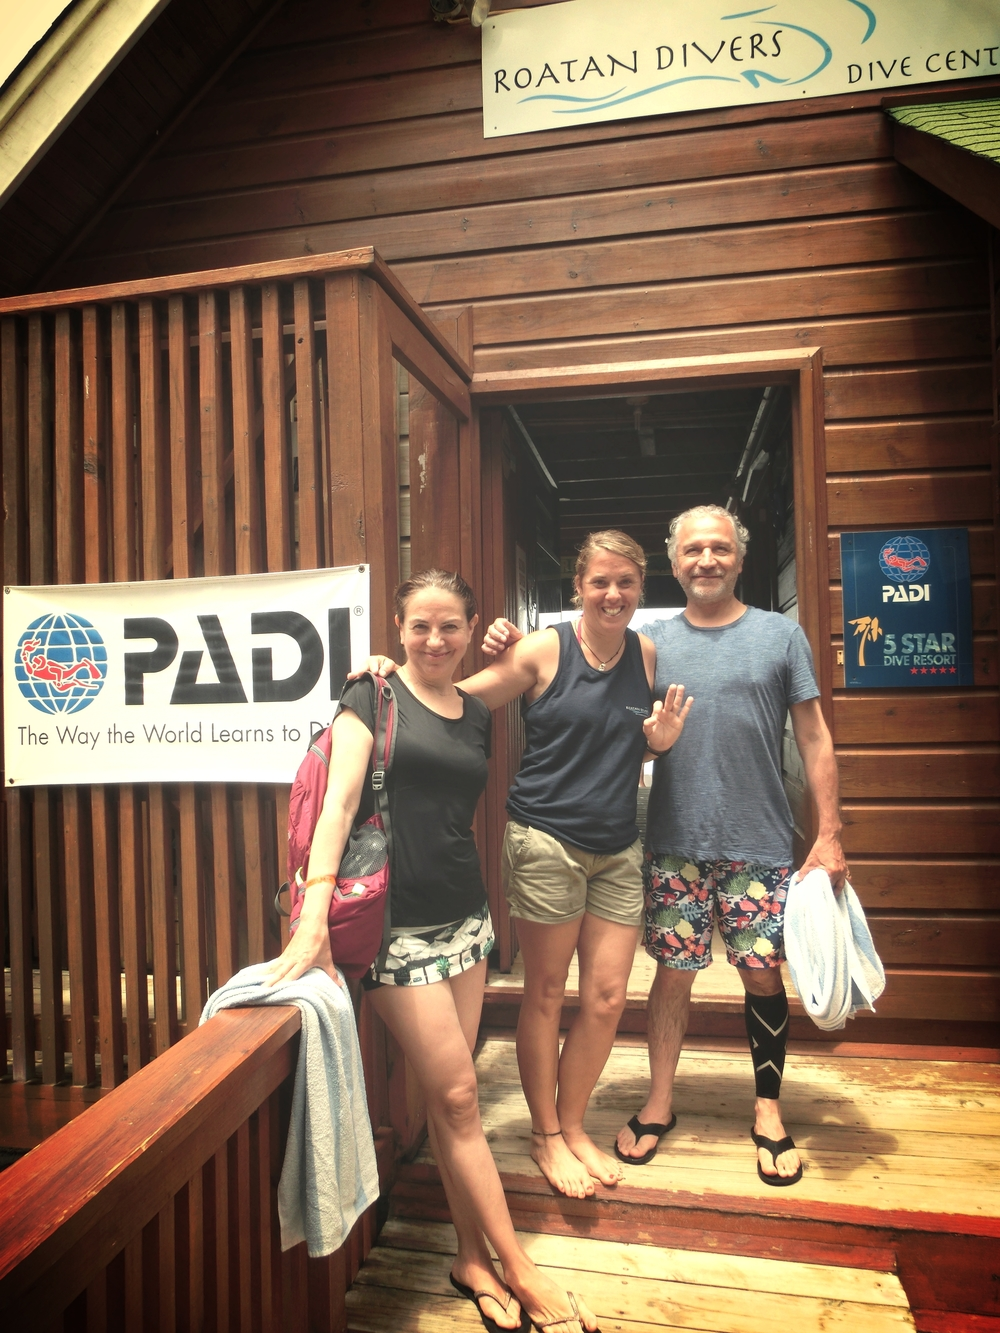 Elide Richard PADI Scuba Diver Roatan Divers